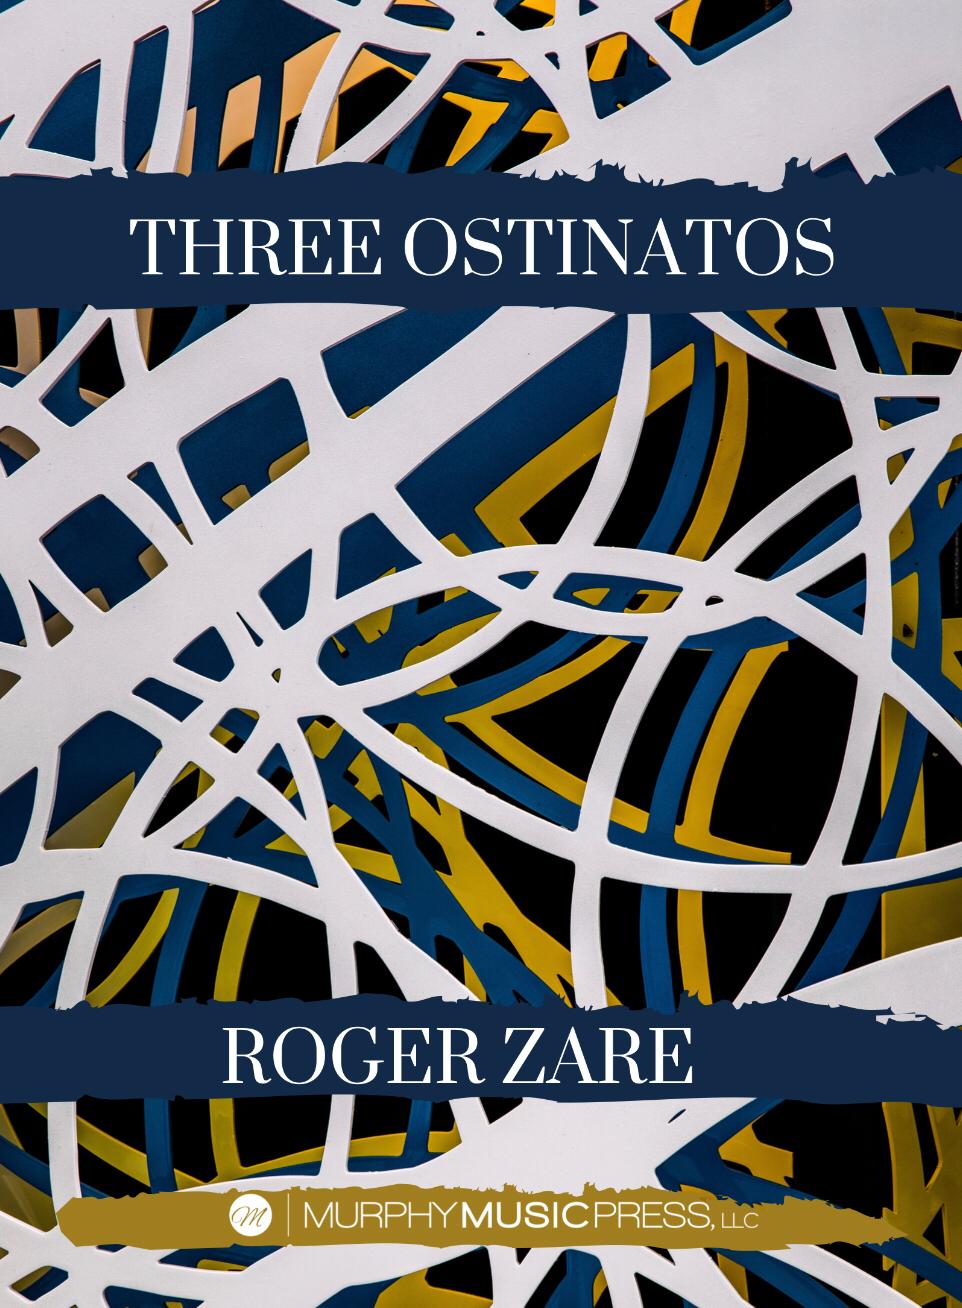 Three Ostinatos  by Roger Zare